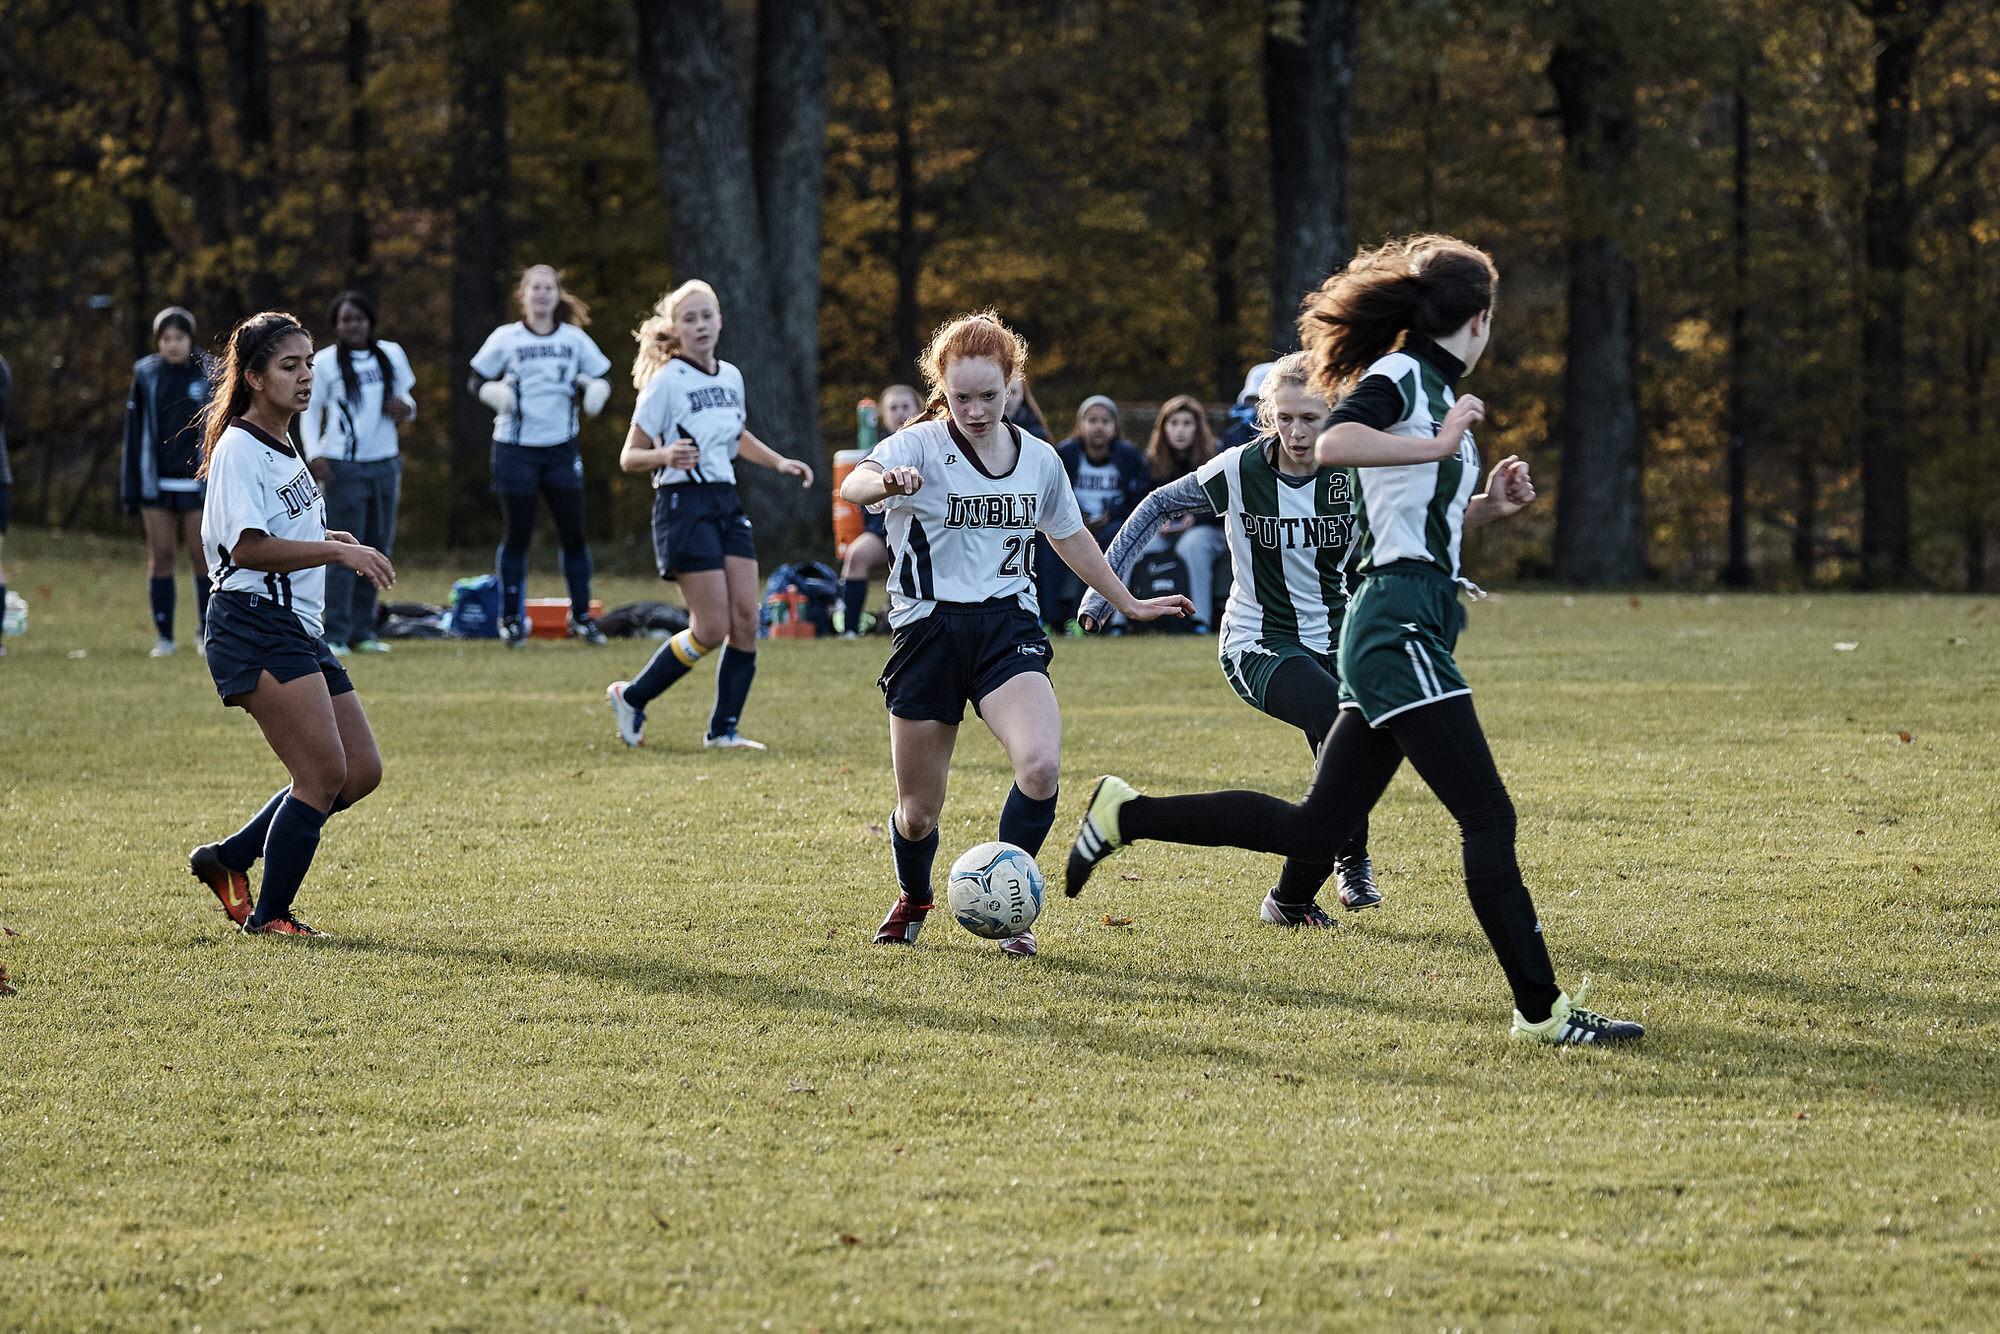 Girls Varsity Soccer vs. Putney School - October 26, 2018 - 048.jpg